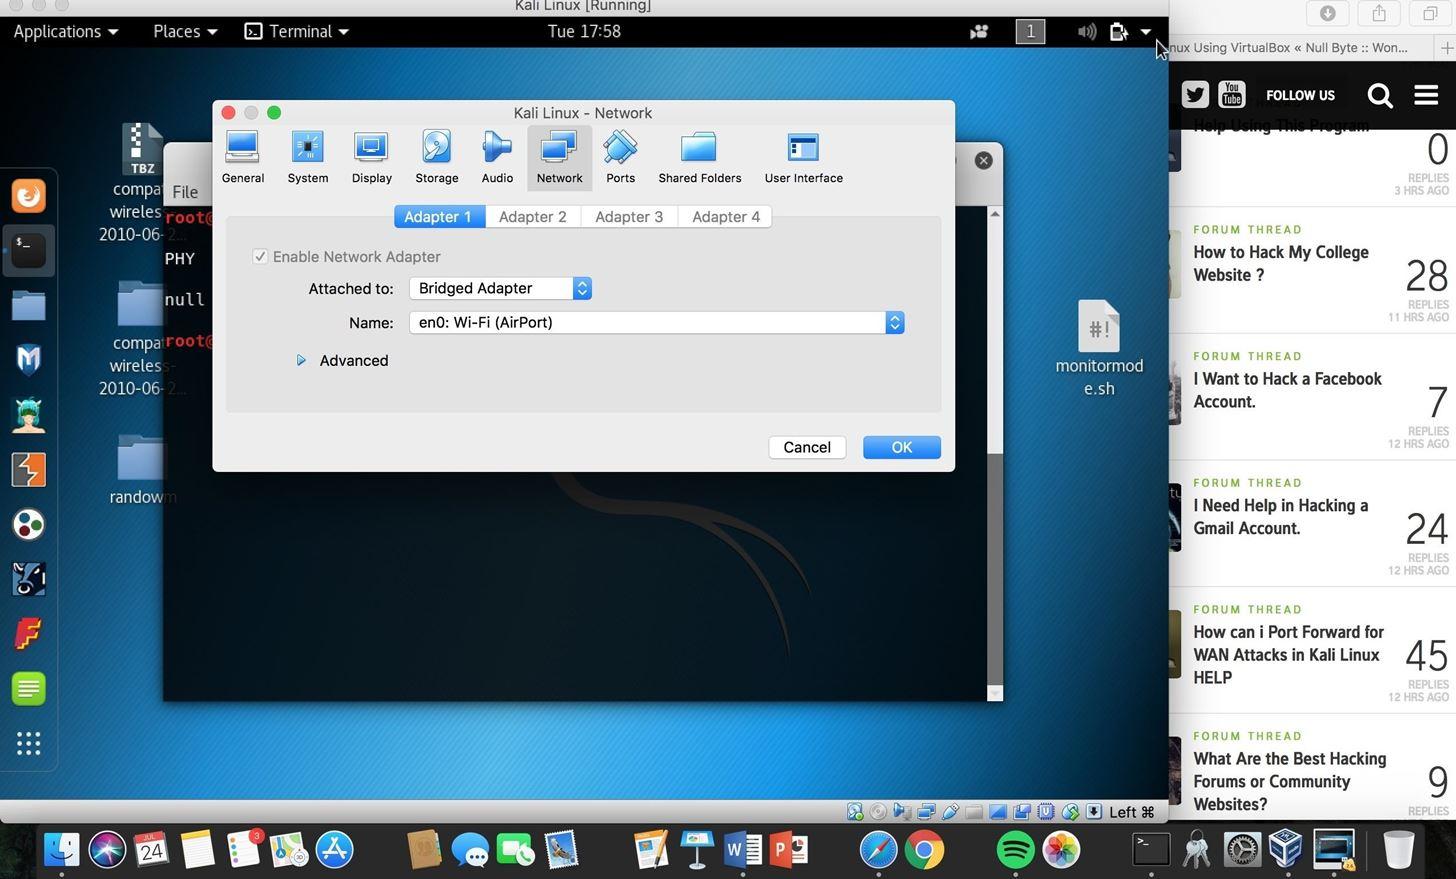 Kali Linux in Virtual Box Help